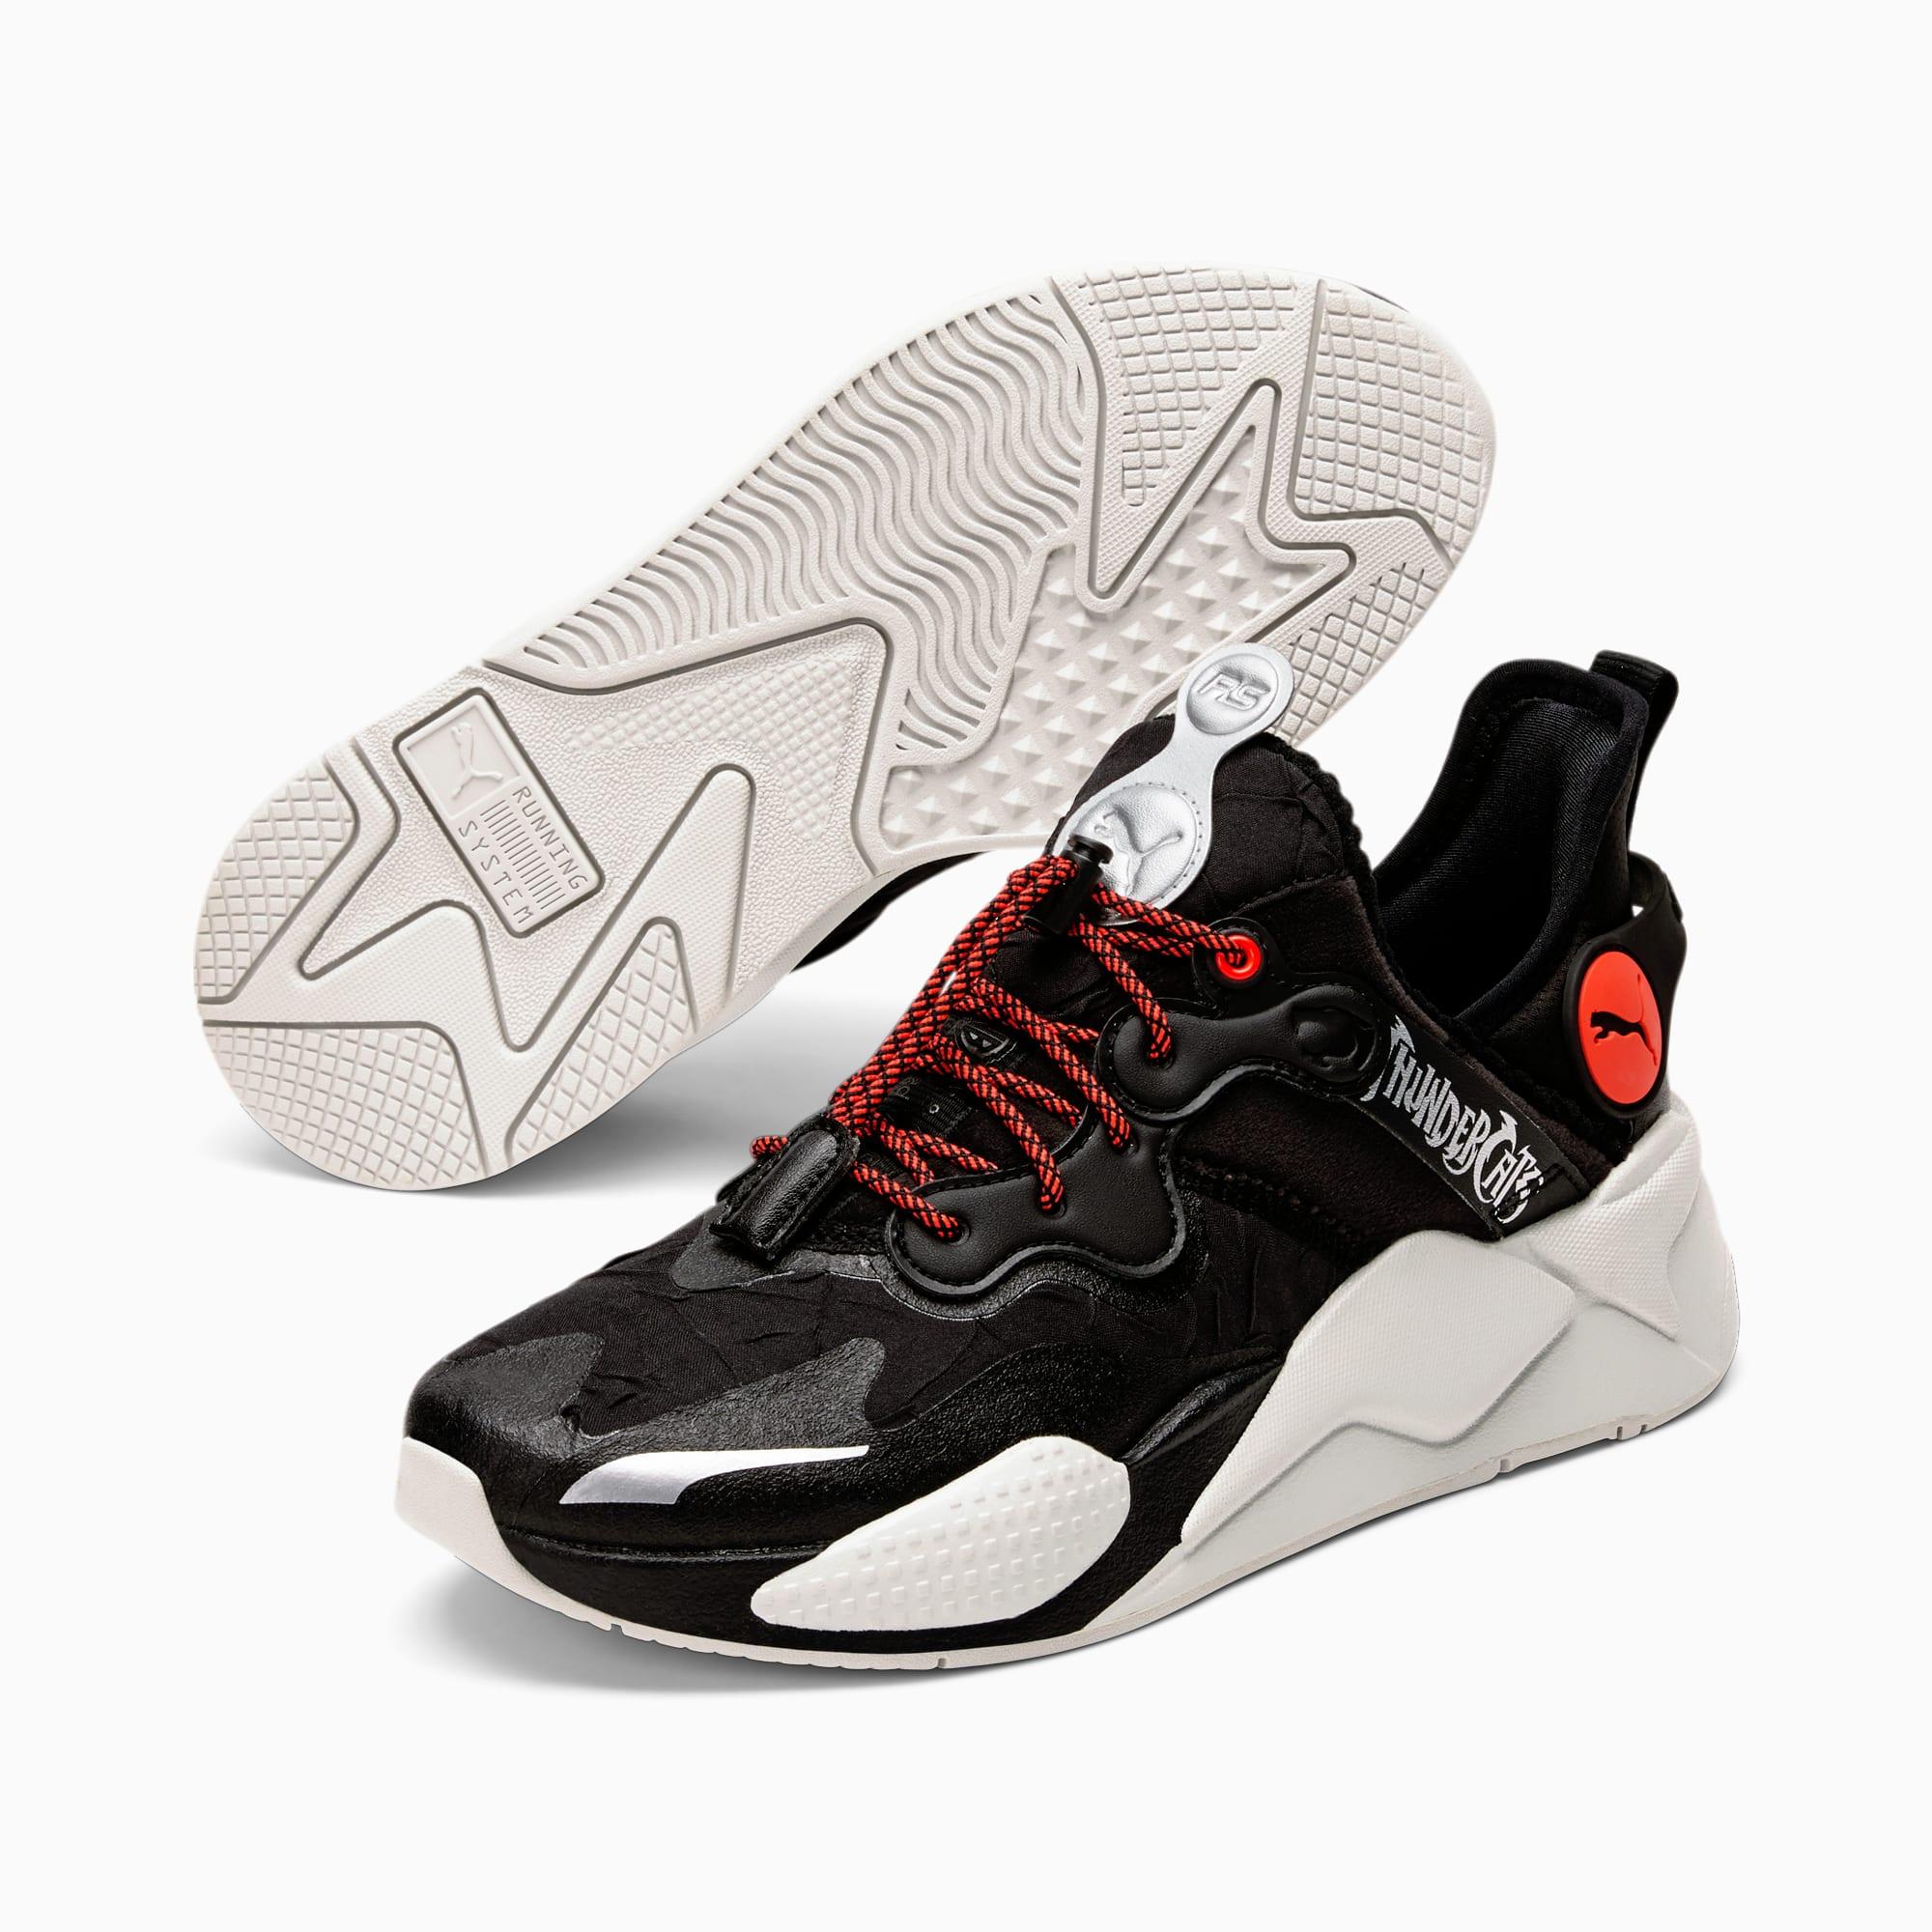 PUMA x THUNDERCATS RS-X T3CH Cat's Lair Sneakers | PUMA US